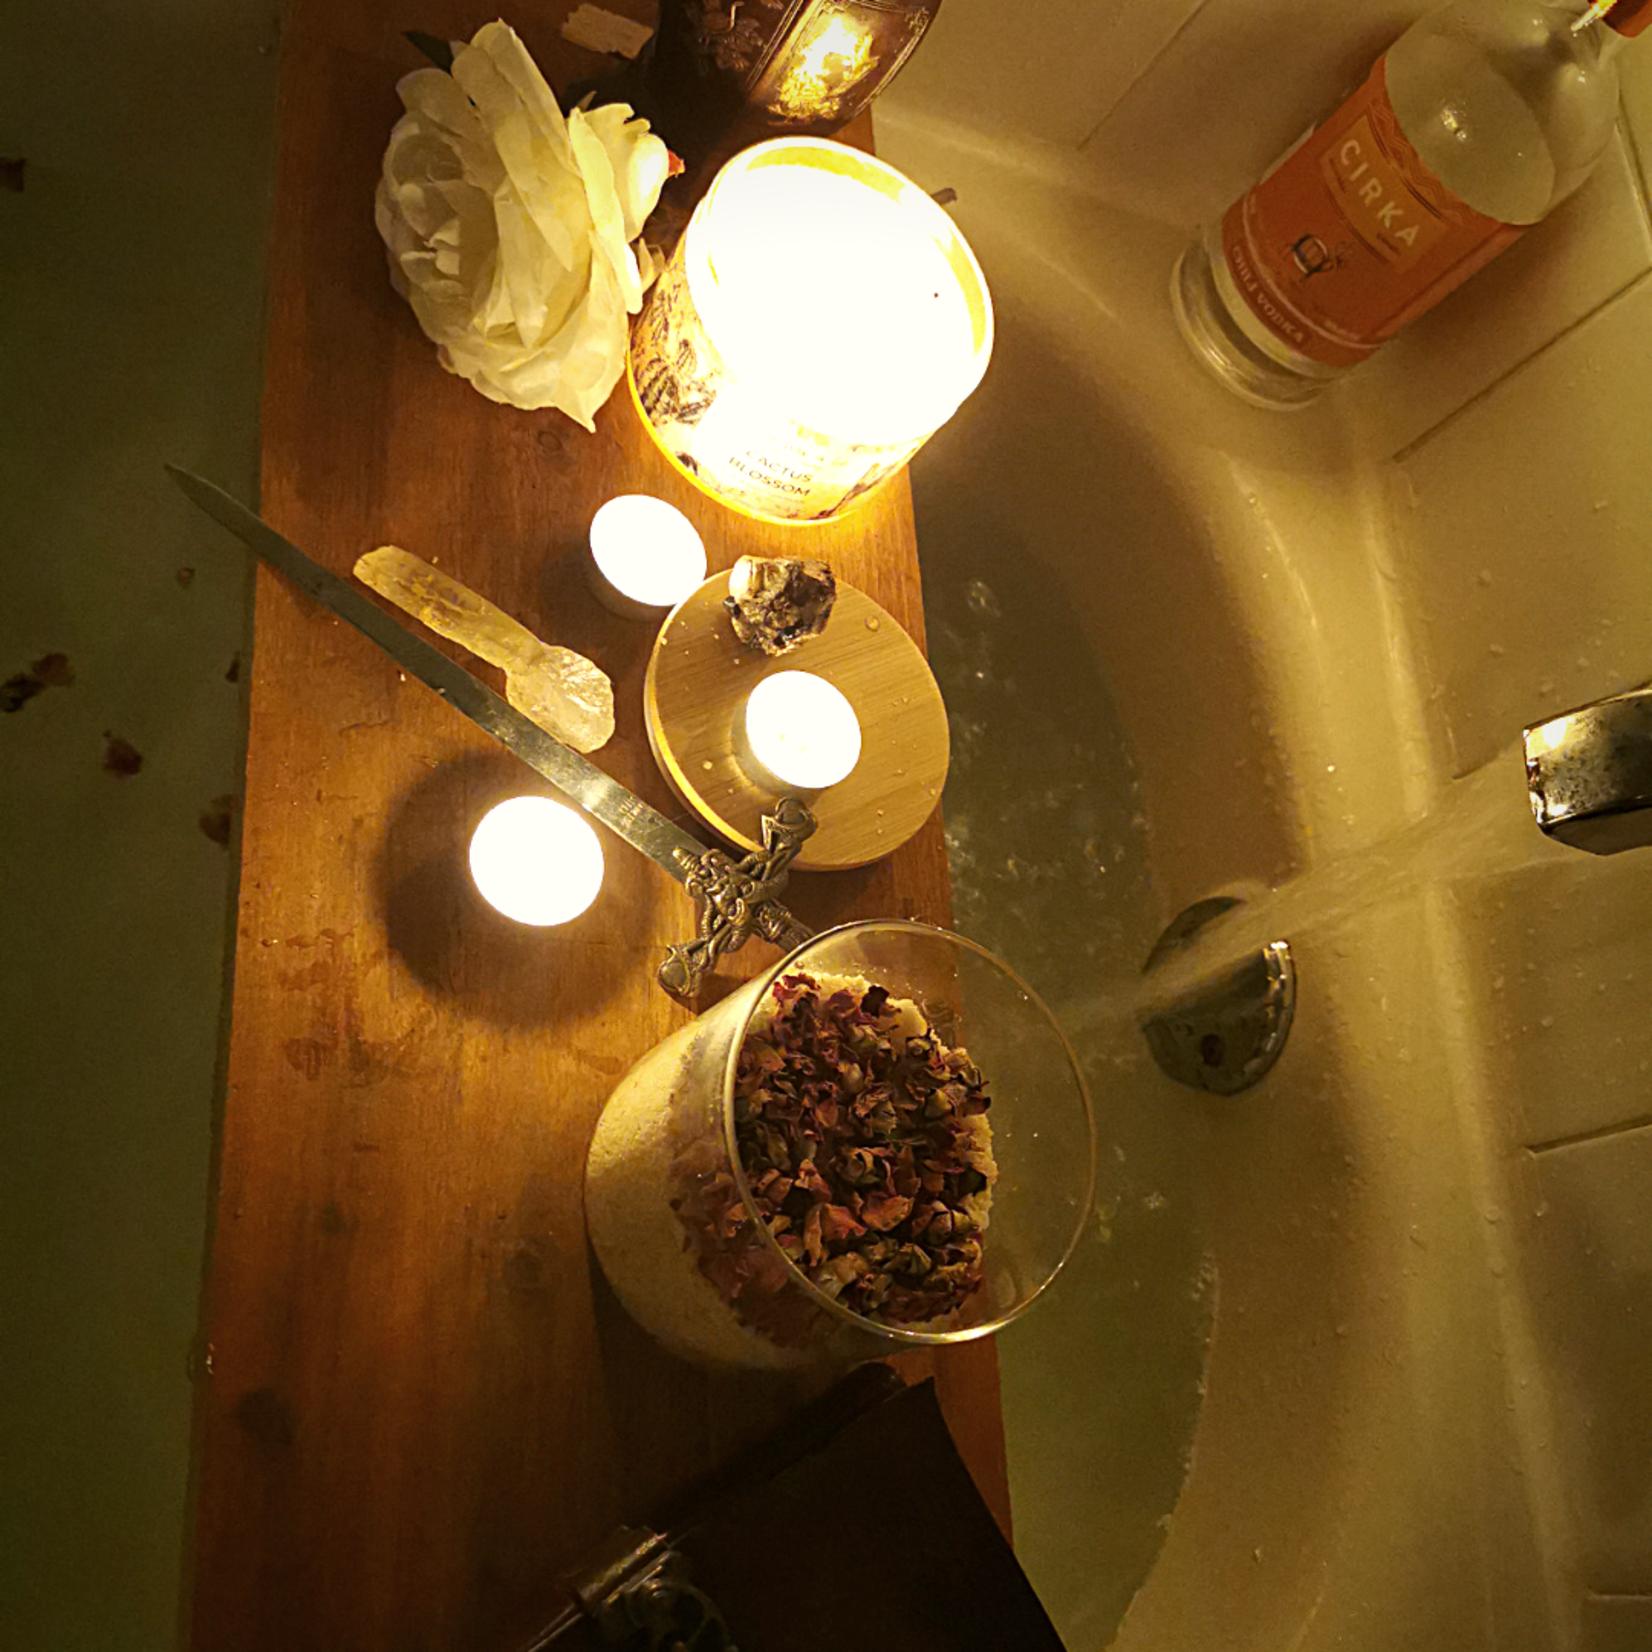 Lola Bath salts - Lola